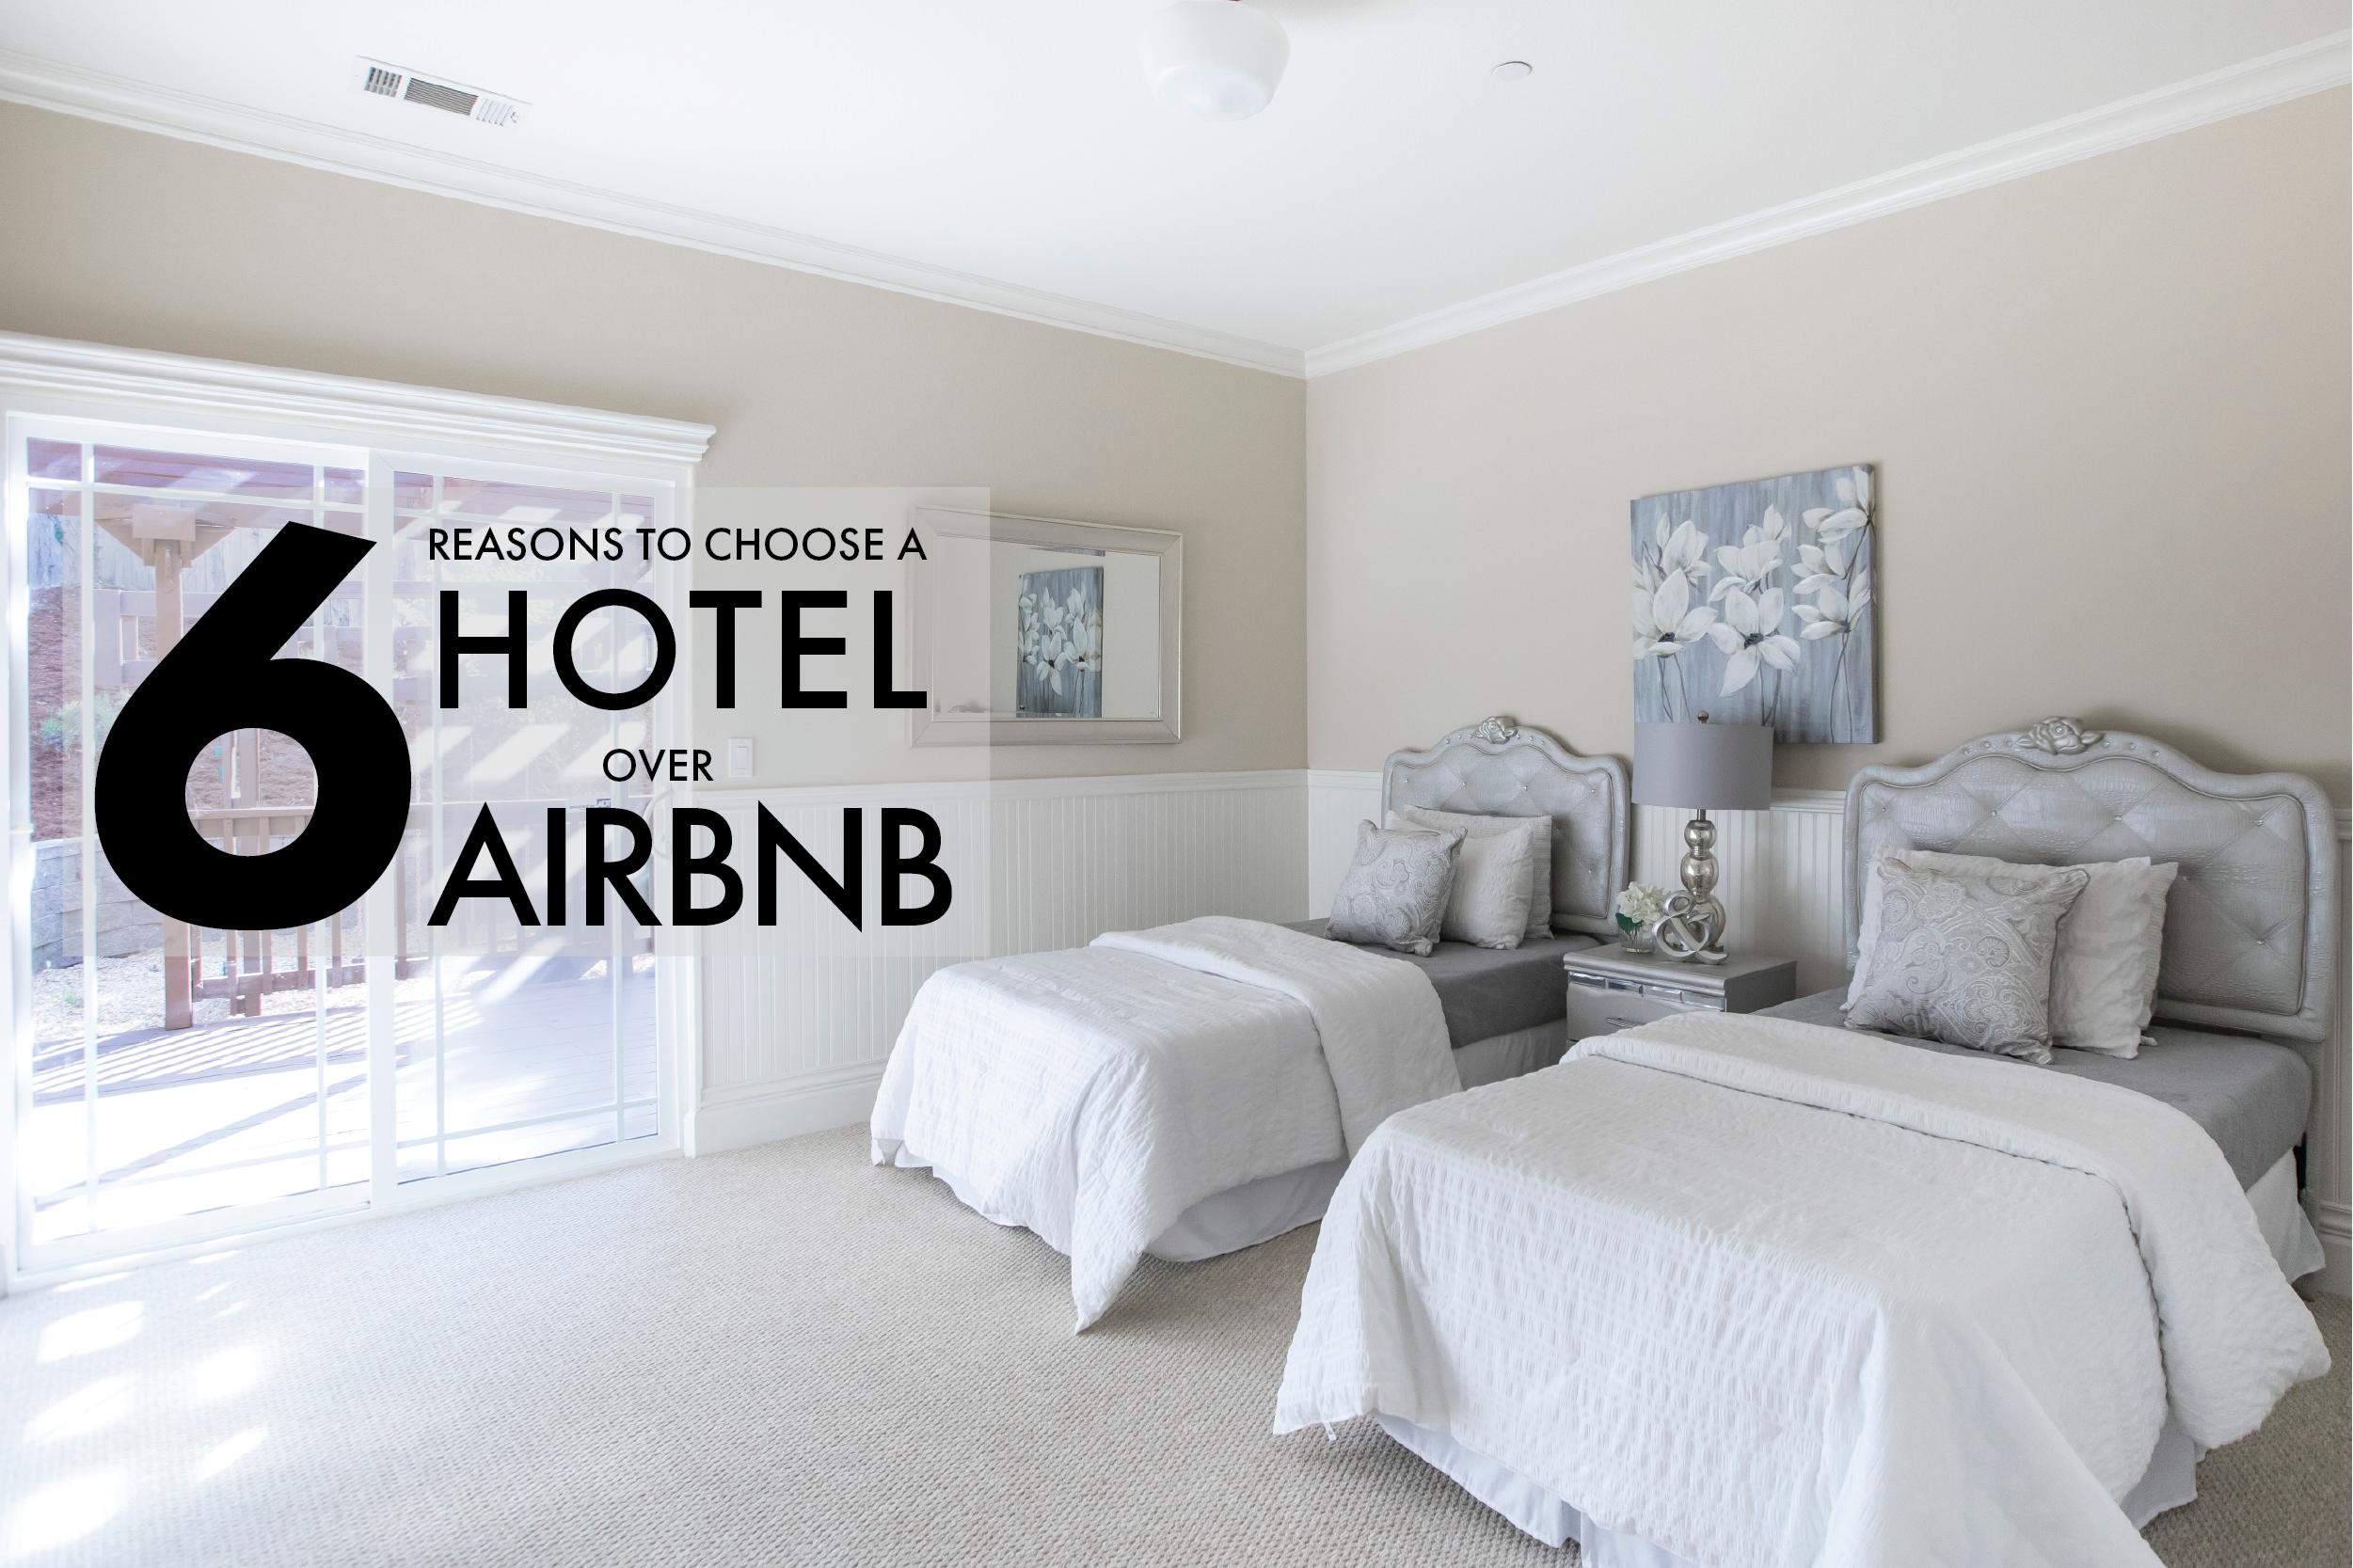 Hotel vs Airbnb